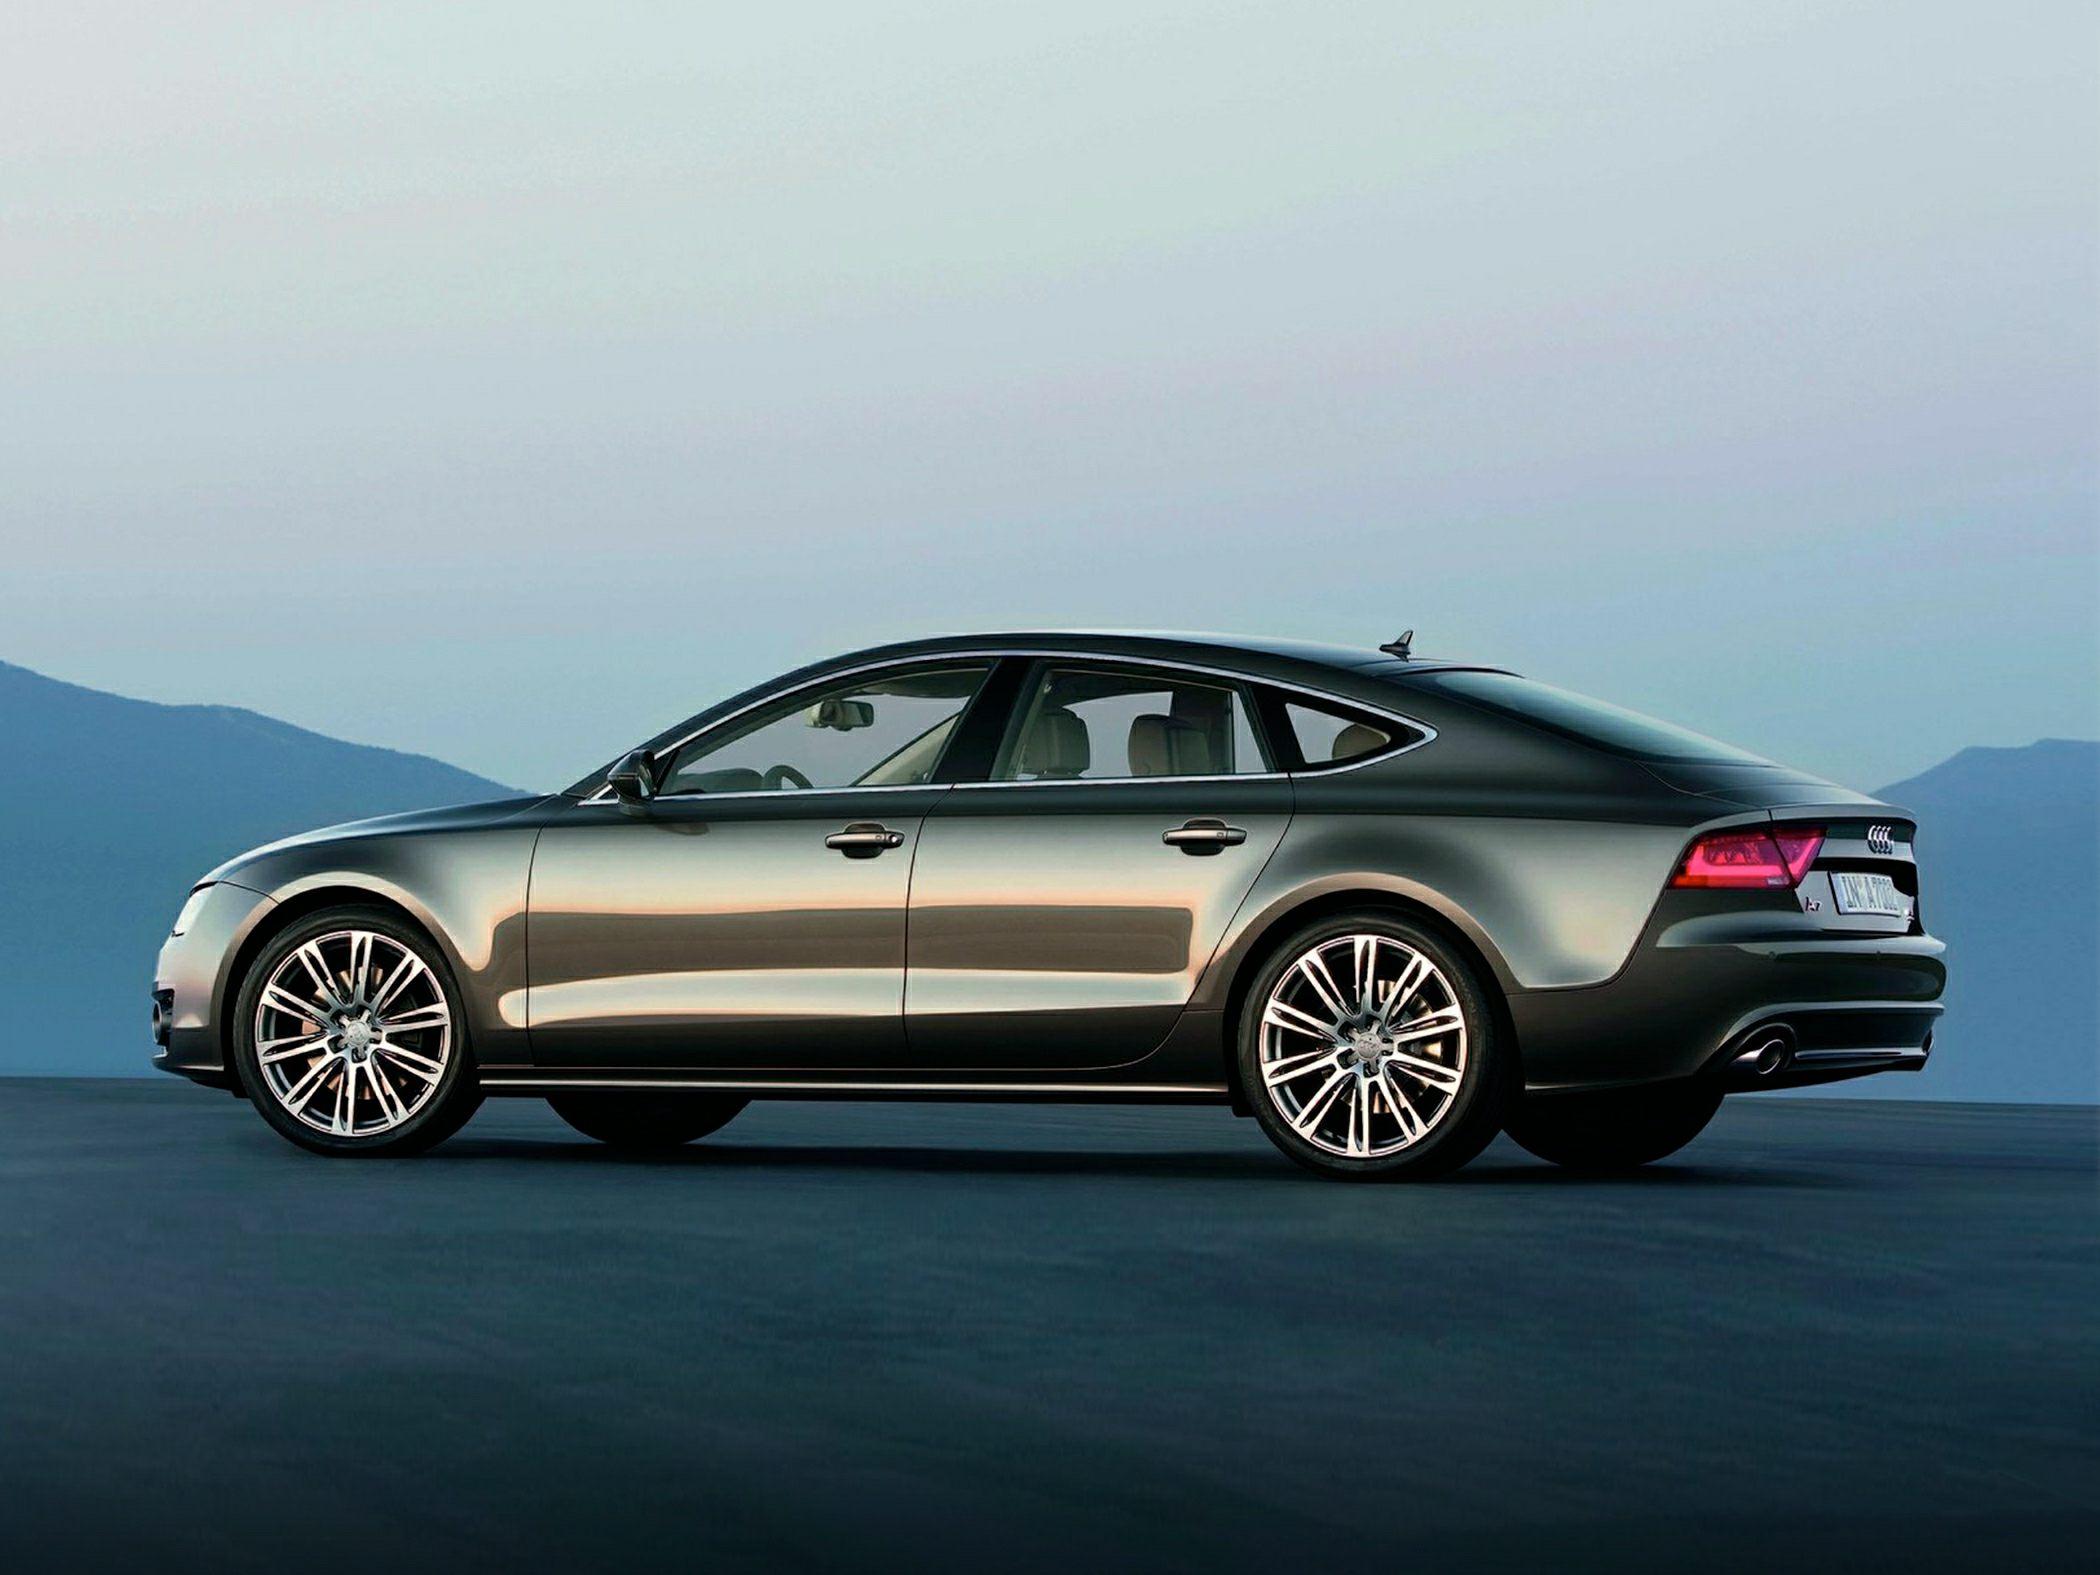 Audi A7 I 2010 - 2014 Liftback #6